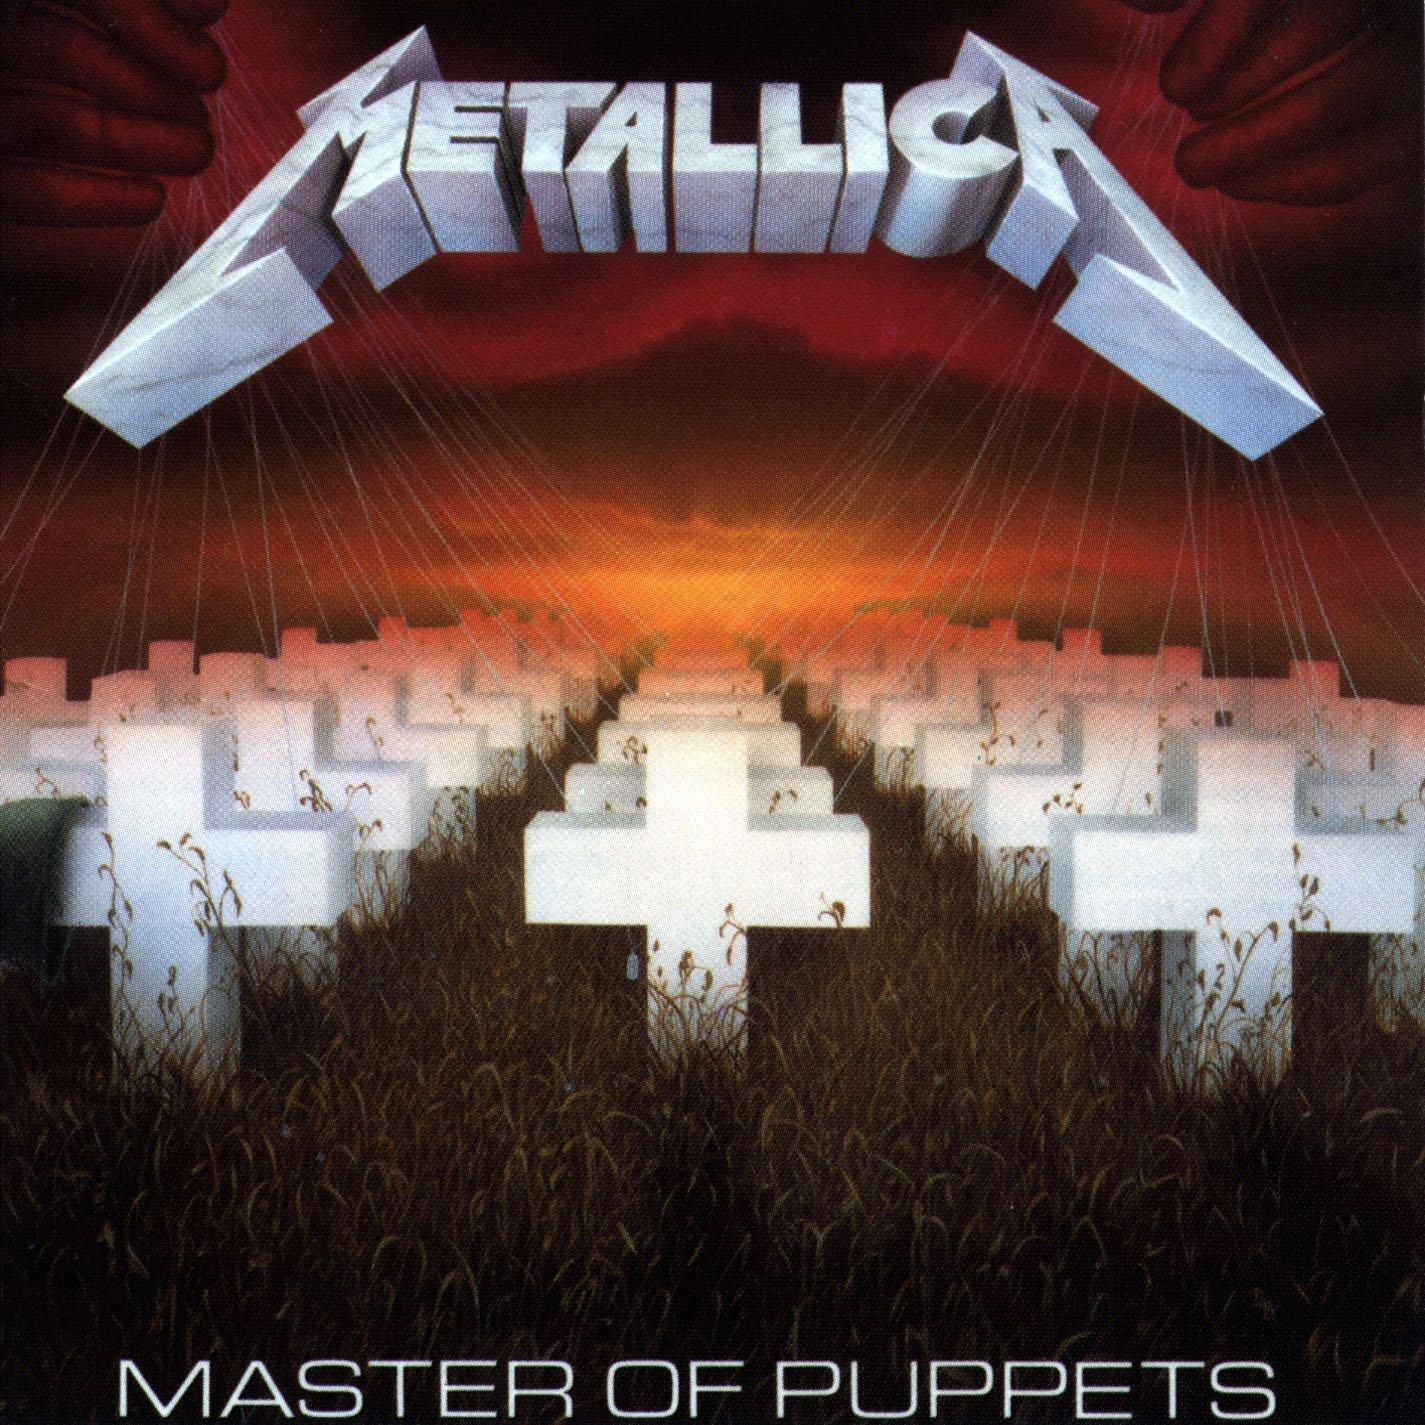 Vinilo : Metallica - Master of Puppets (LP Vinyl)